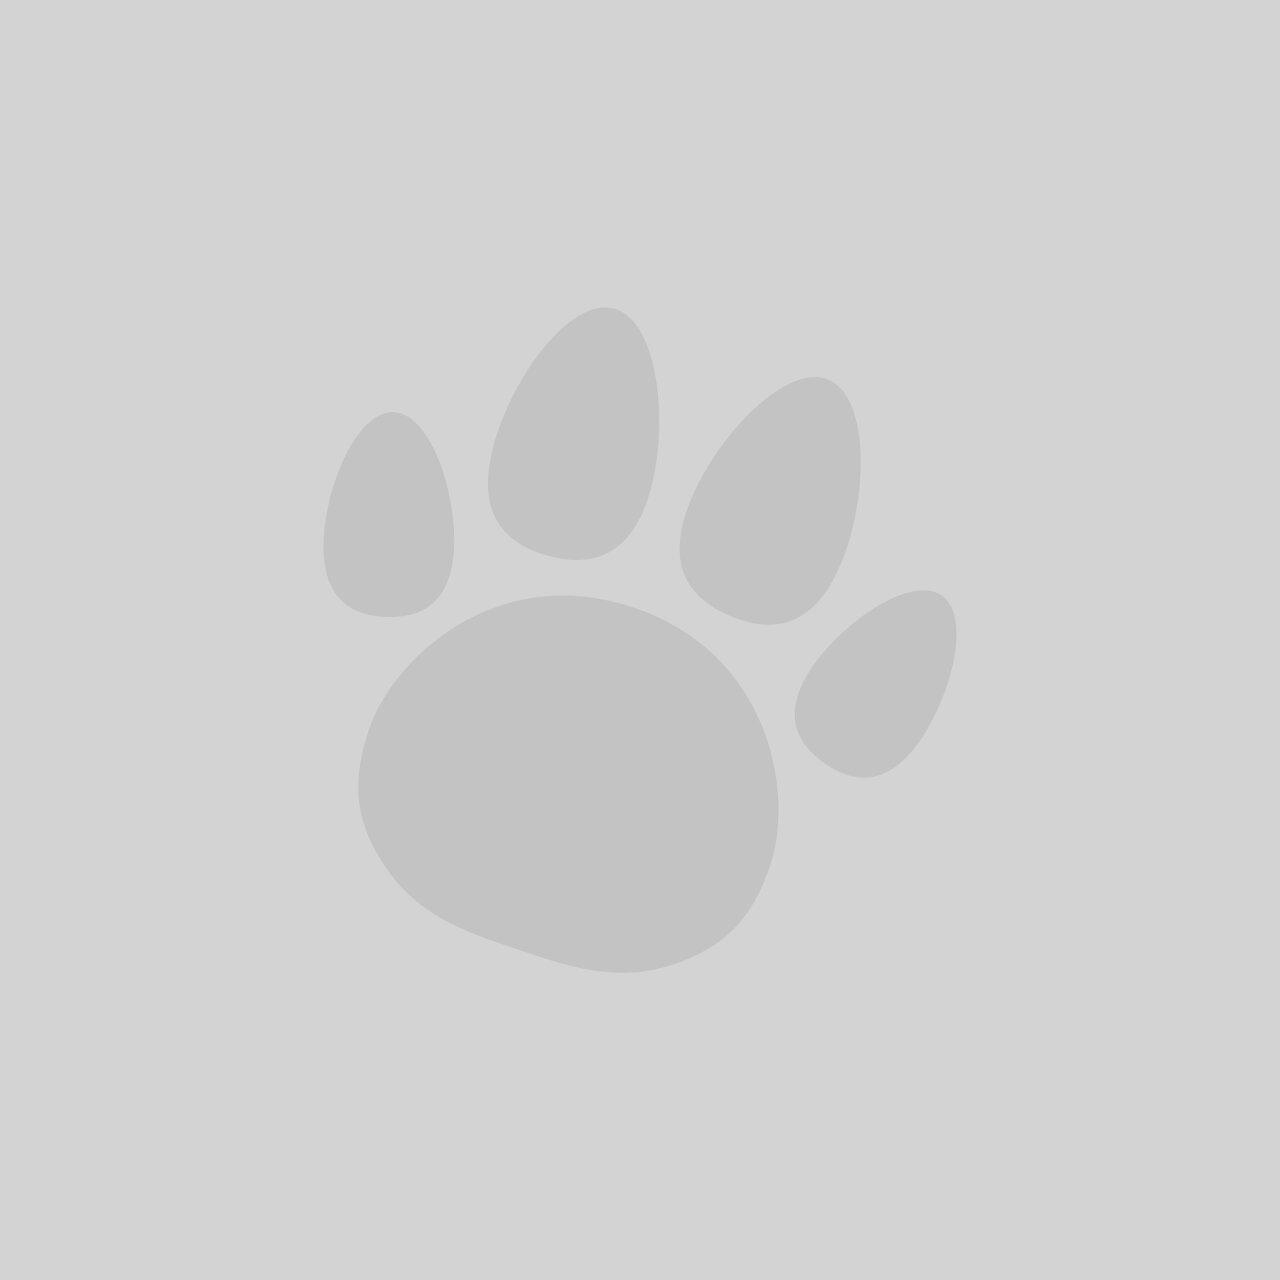 FURminator for Dogs with Short Hair - Medium